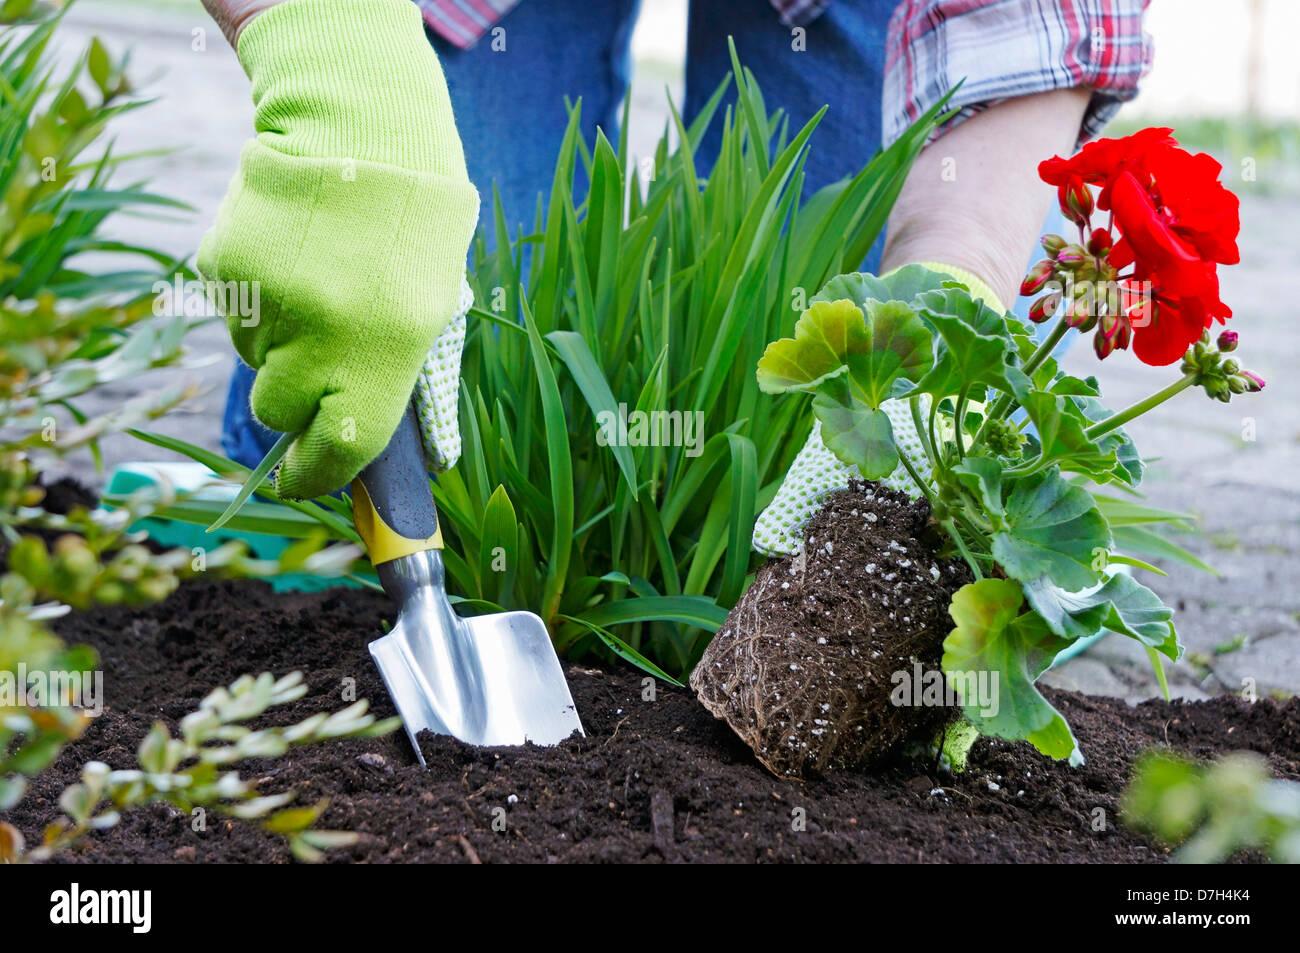 Gardening, Planting Flowers, Red Geranium - Stock Image